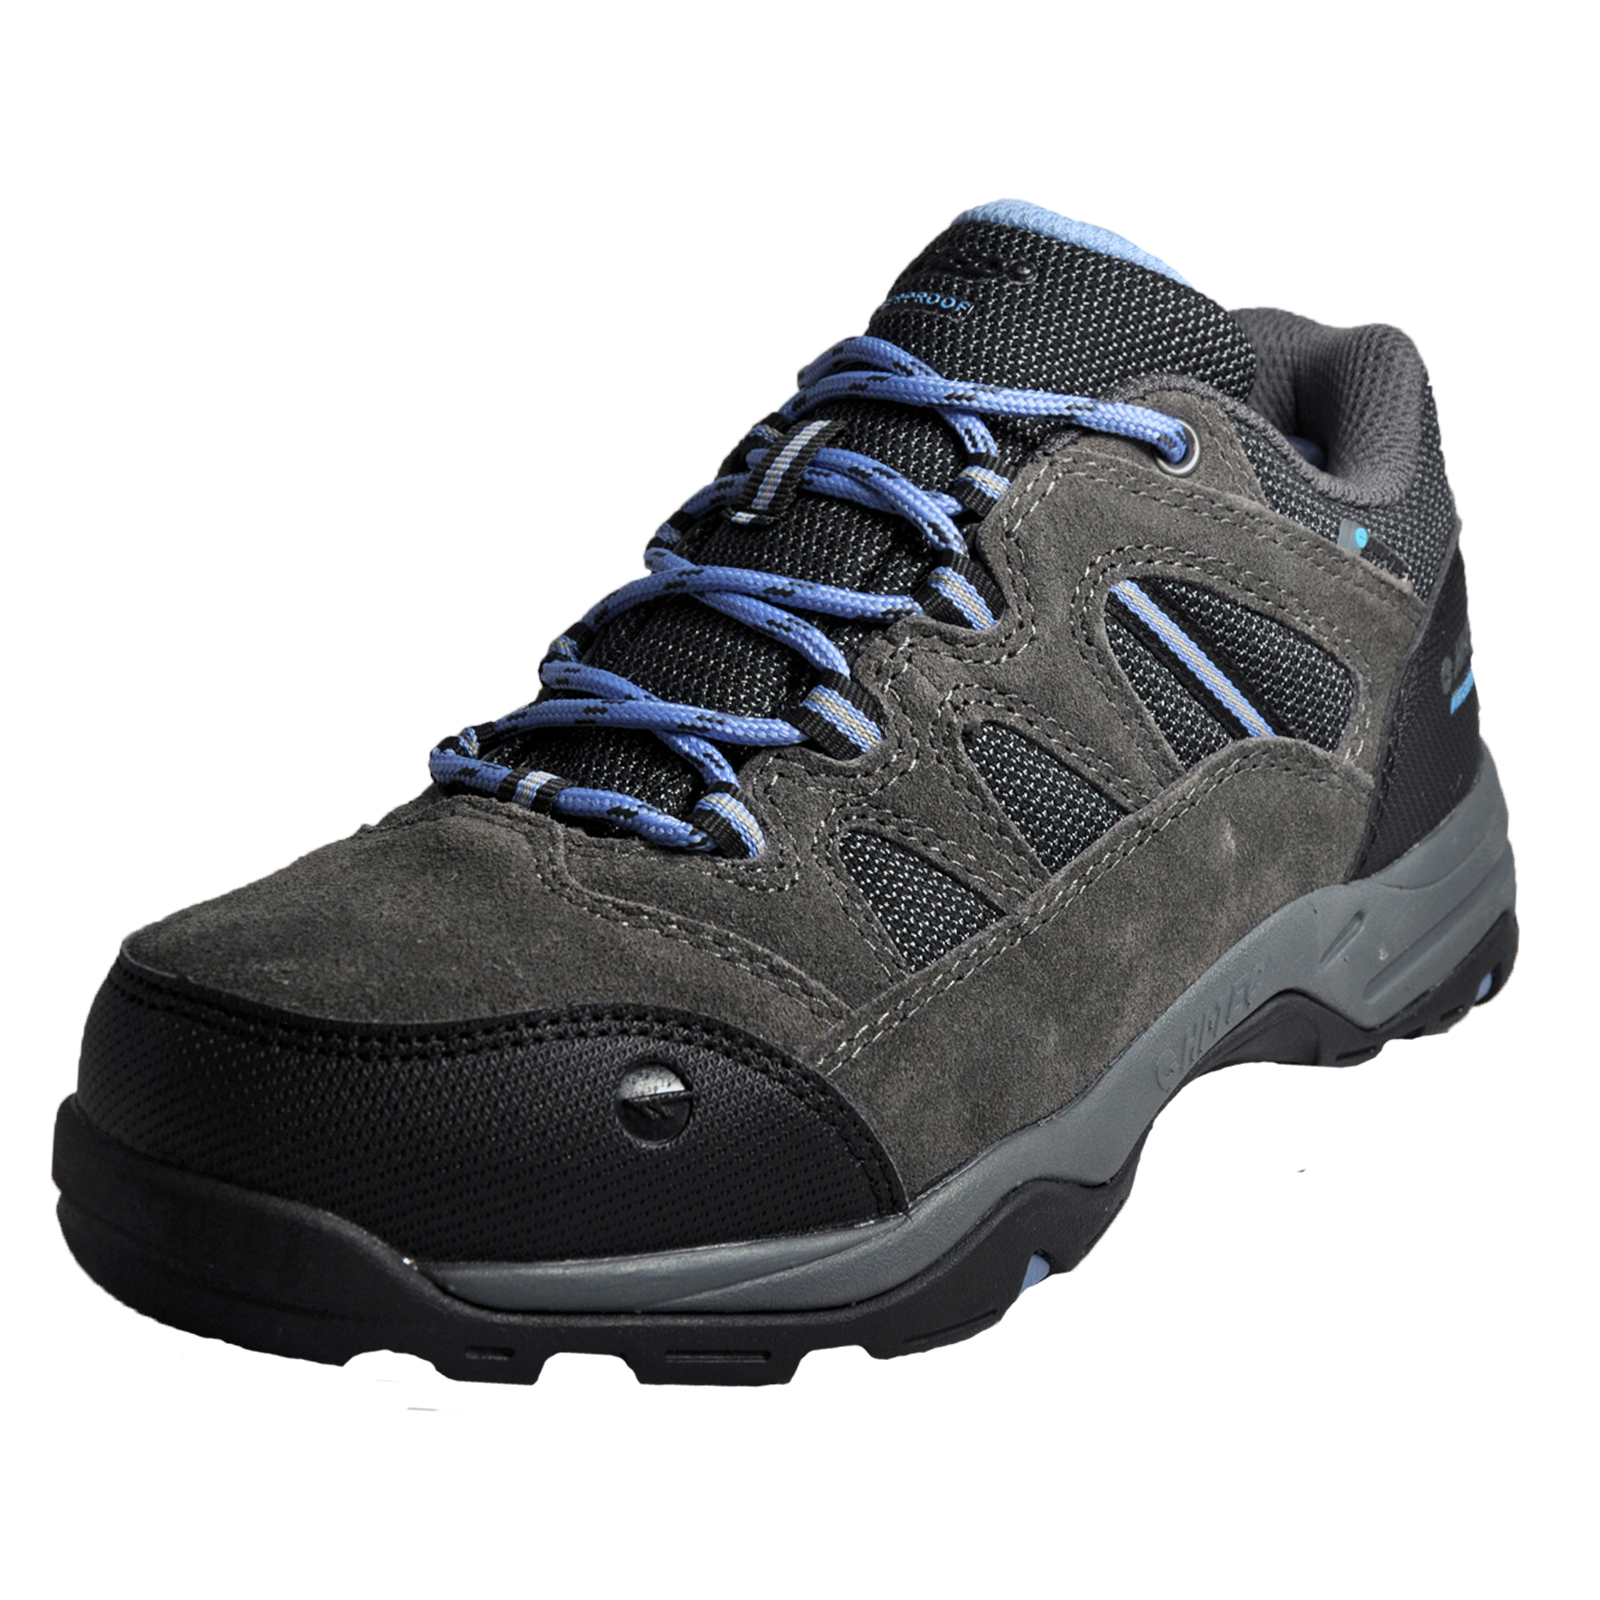 Hi Tec Bandera II WP Womens Waterproof All Terrain Hiking Shoes Charcoal